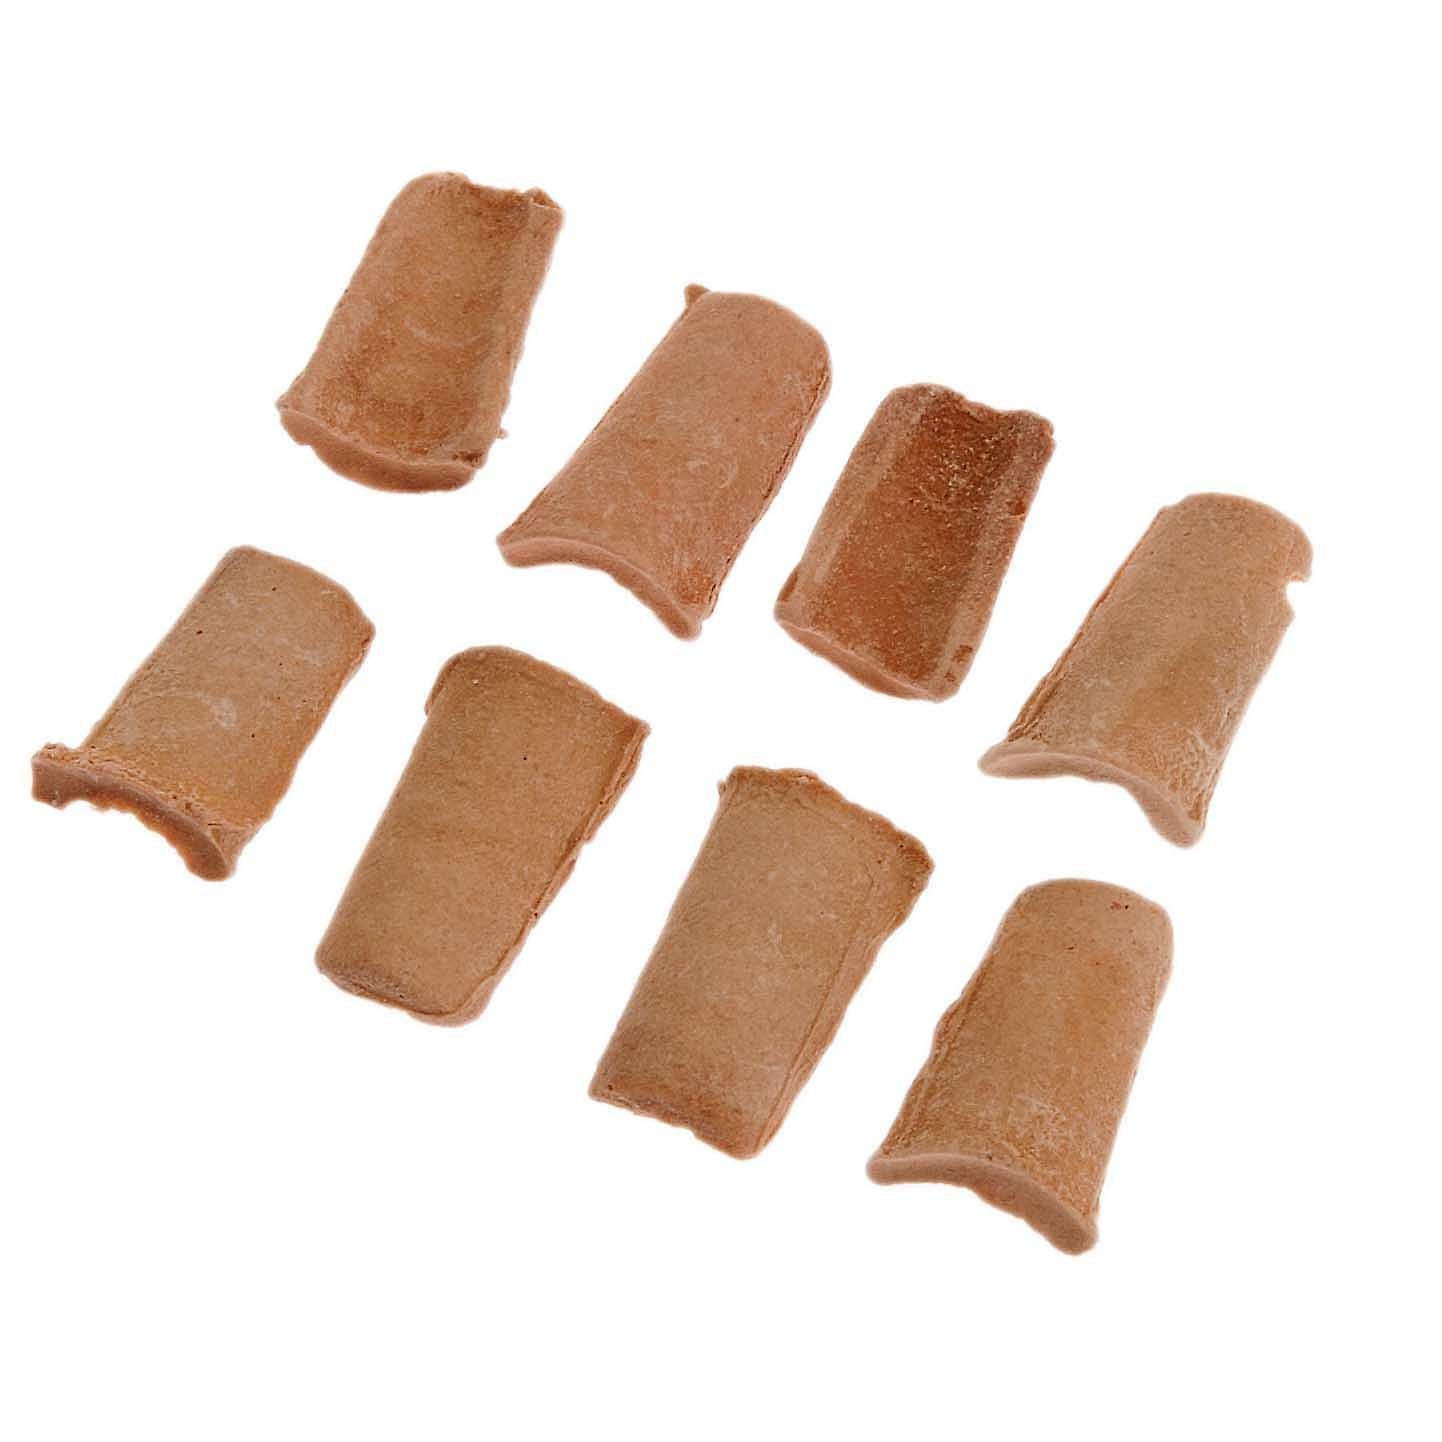 Tegole resina presepe fai da te 60 pz vendita online su for Resina fai da te